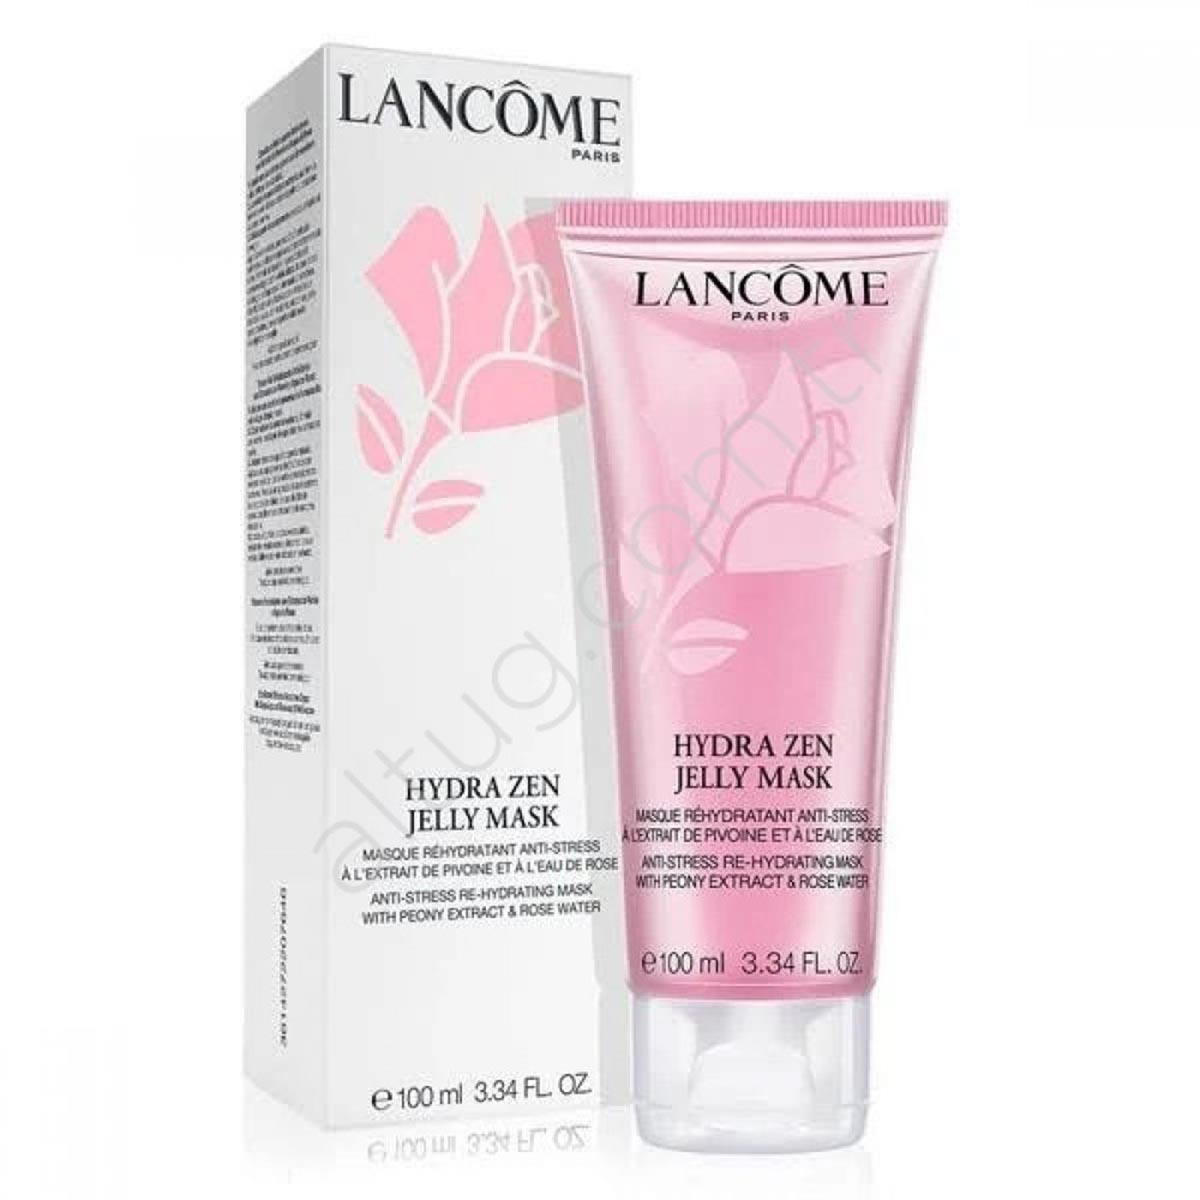 Lancome hydrazen anti stress moisturising cream